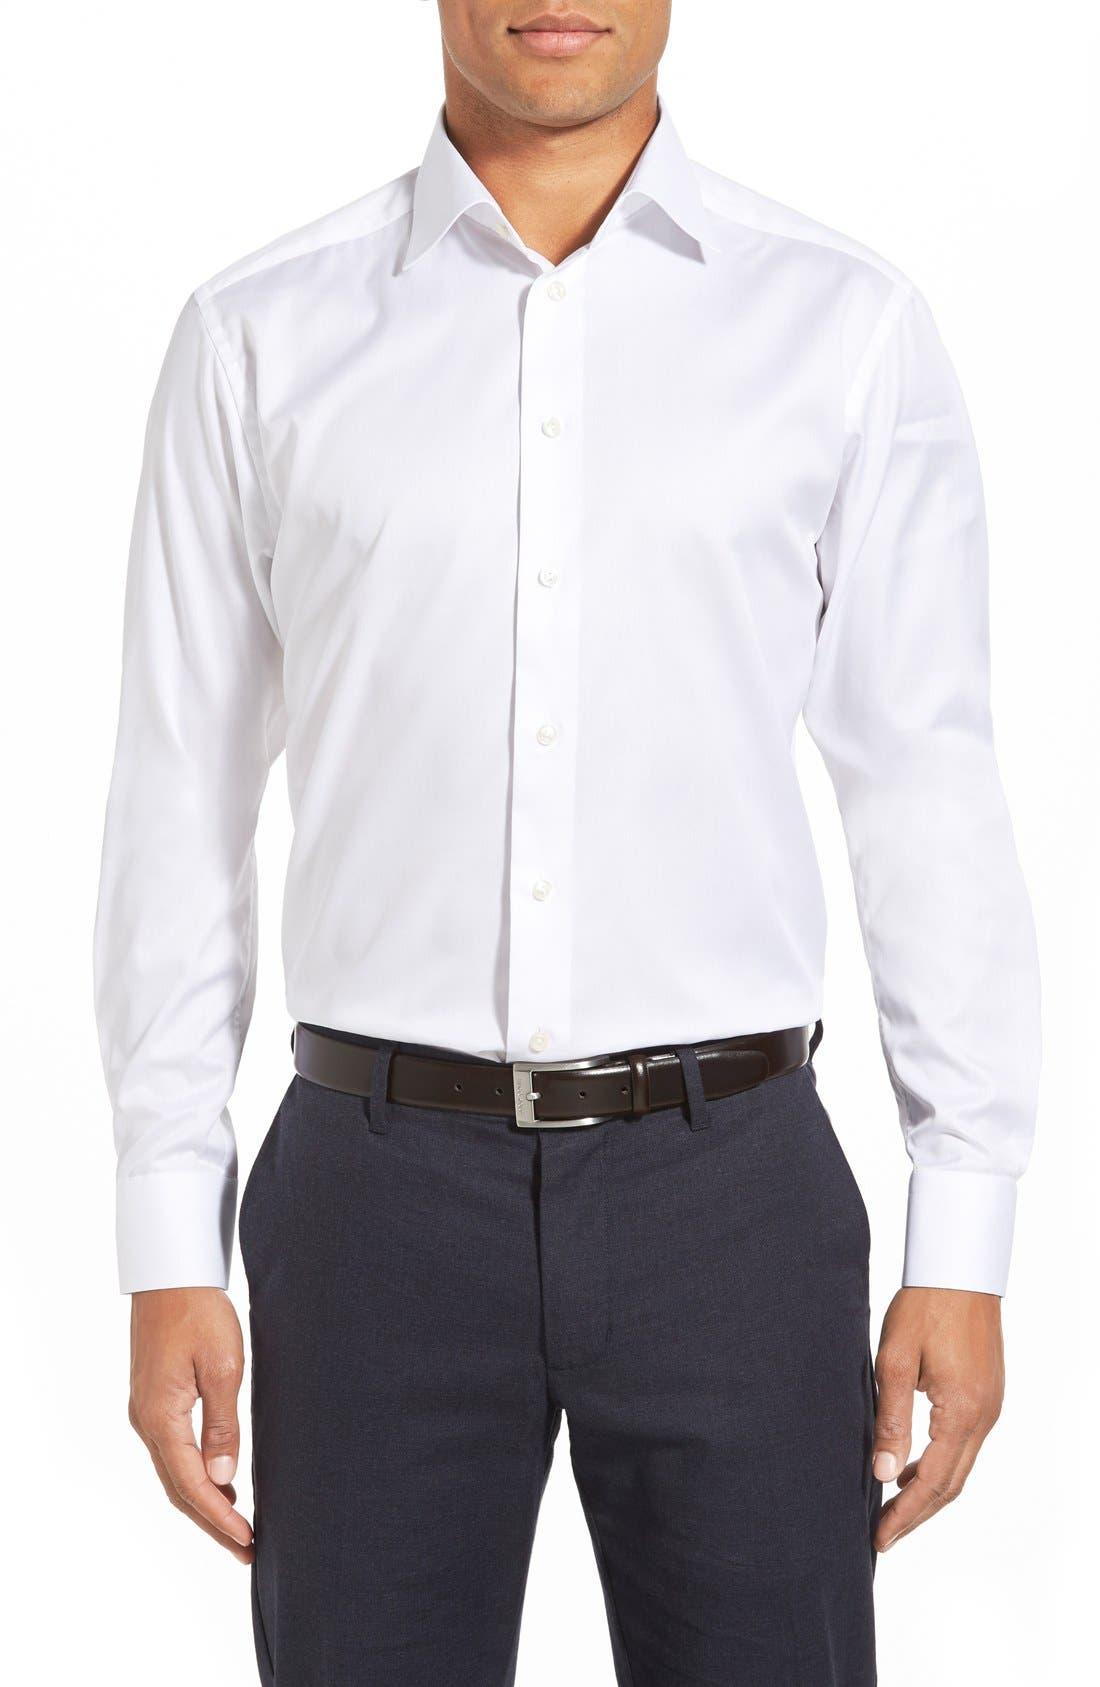 Main Image - Eton Slim Fit Twill Dress Shirt